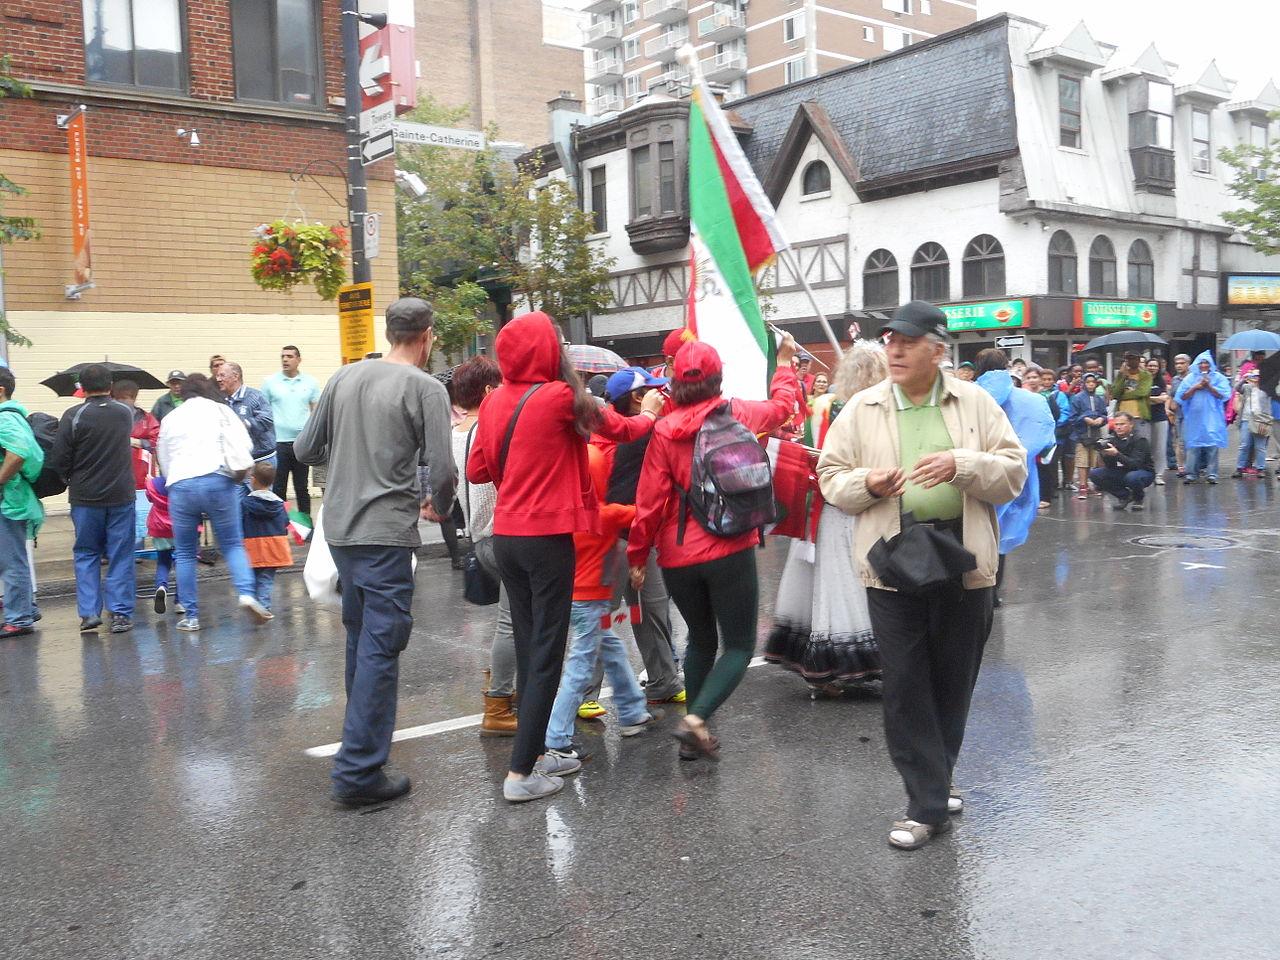 File:Canada Day 2015 on Saint Catherine Street - 116.jpg - Wikimedia